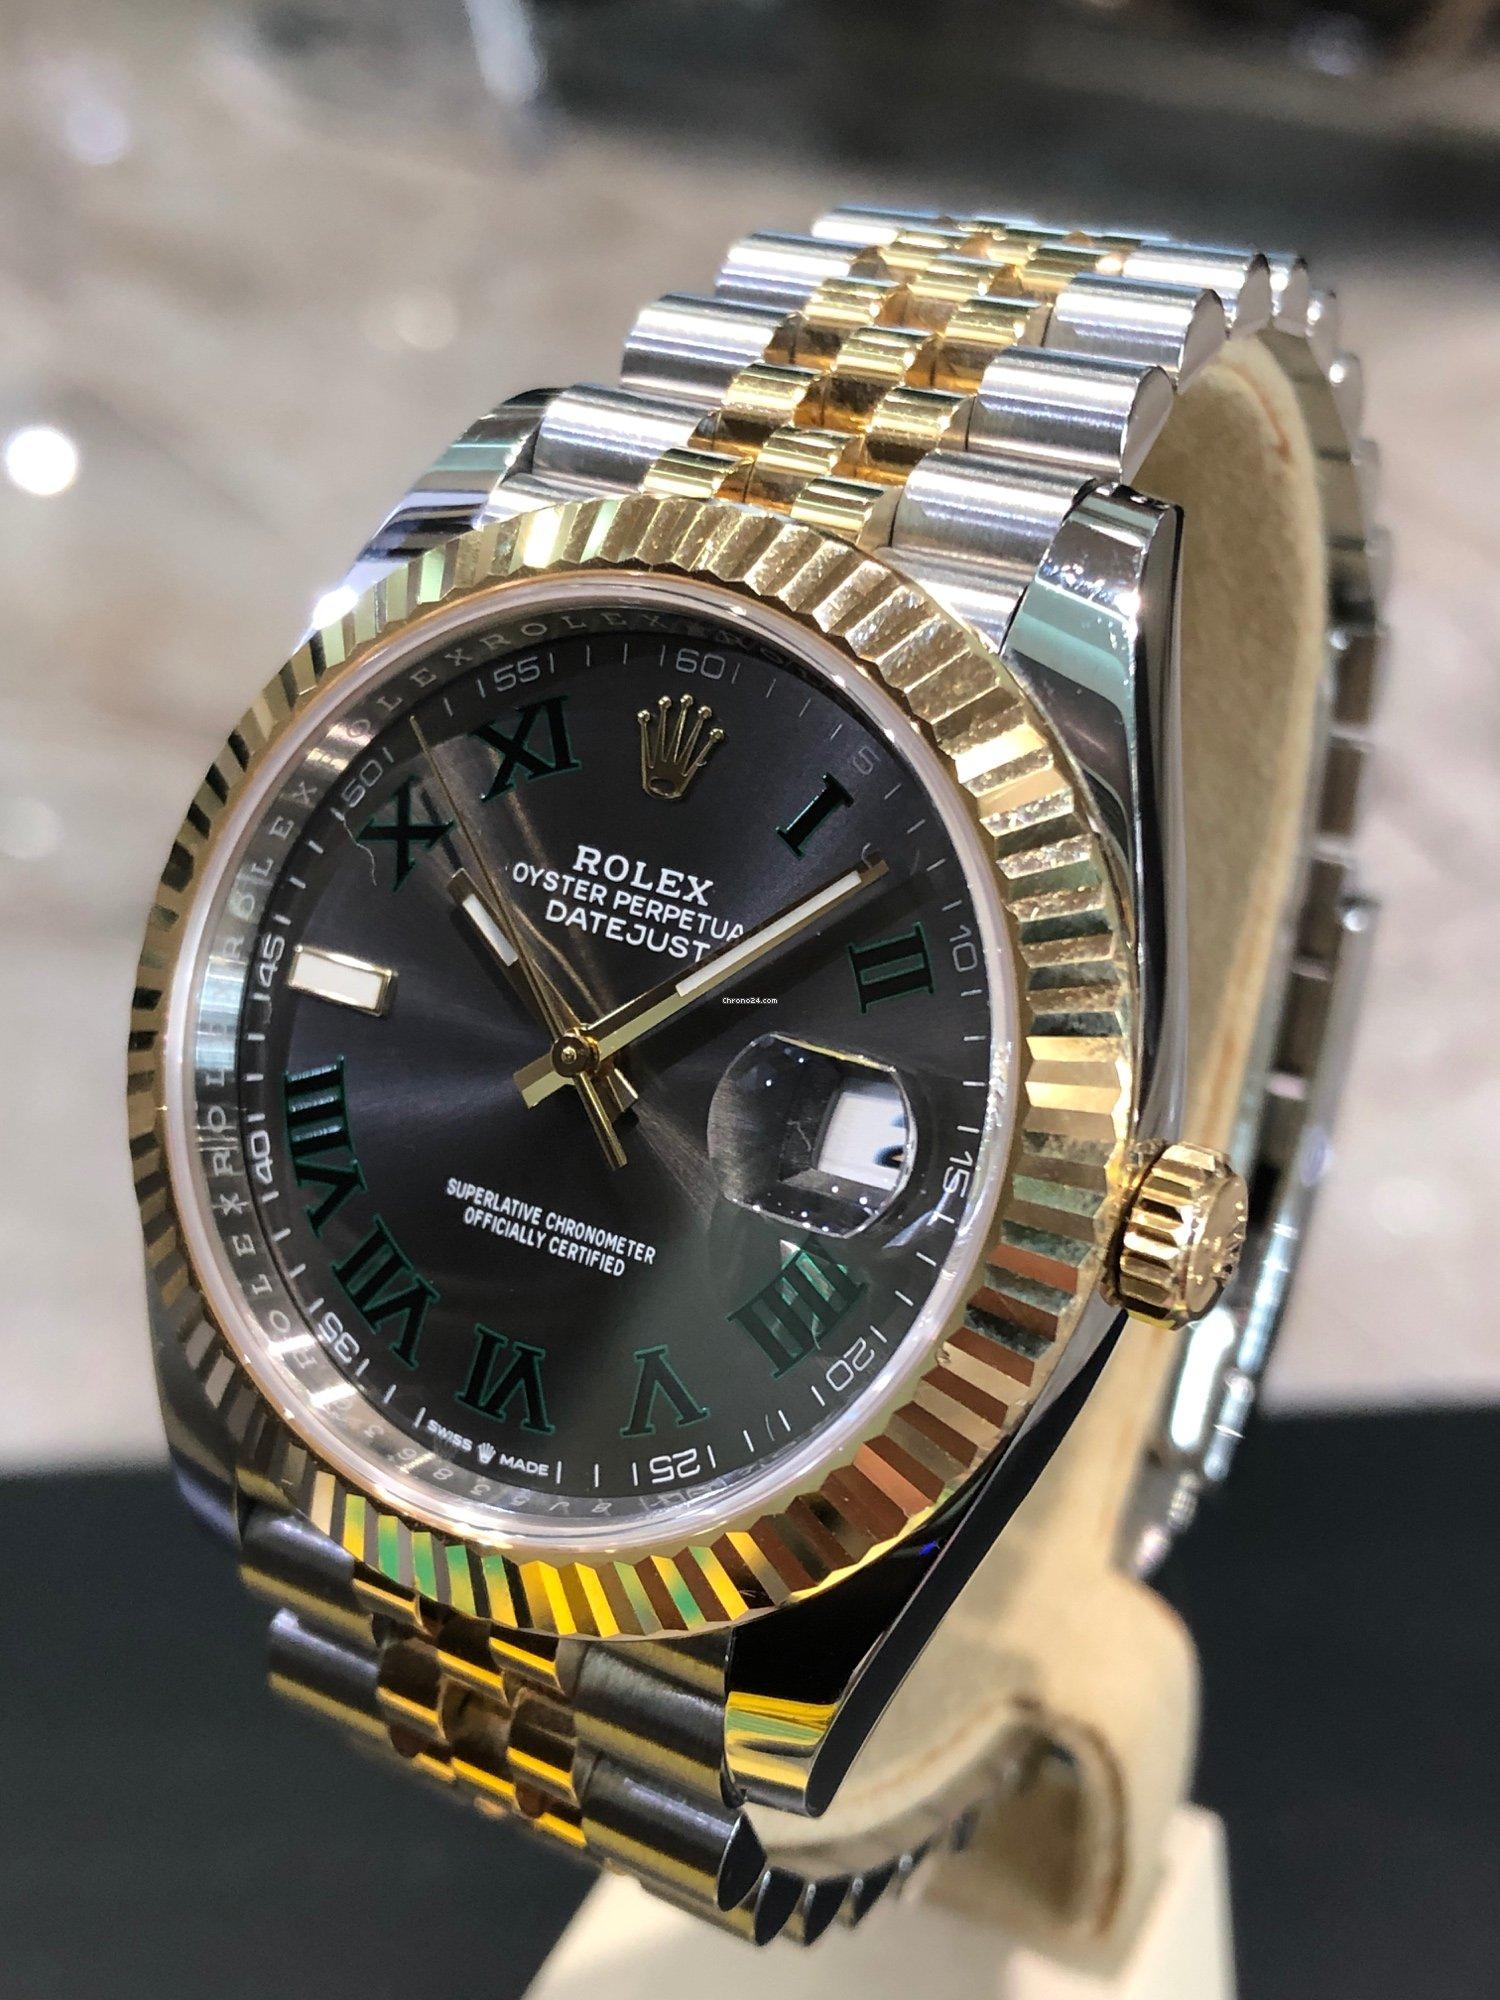 juwelier kö98 gold & uhren